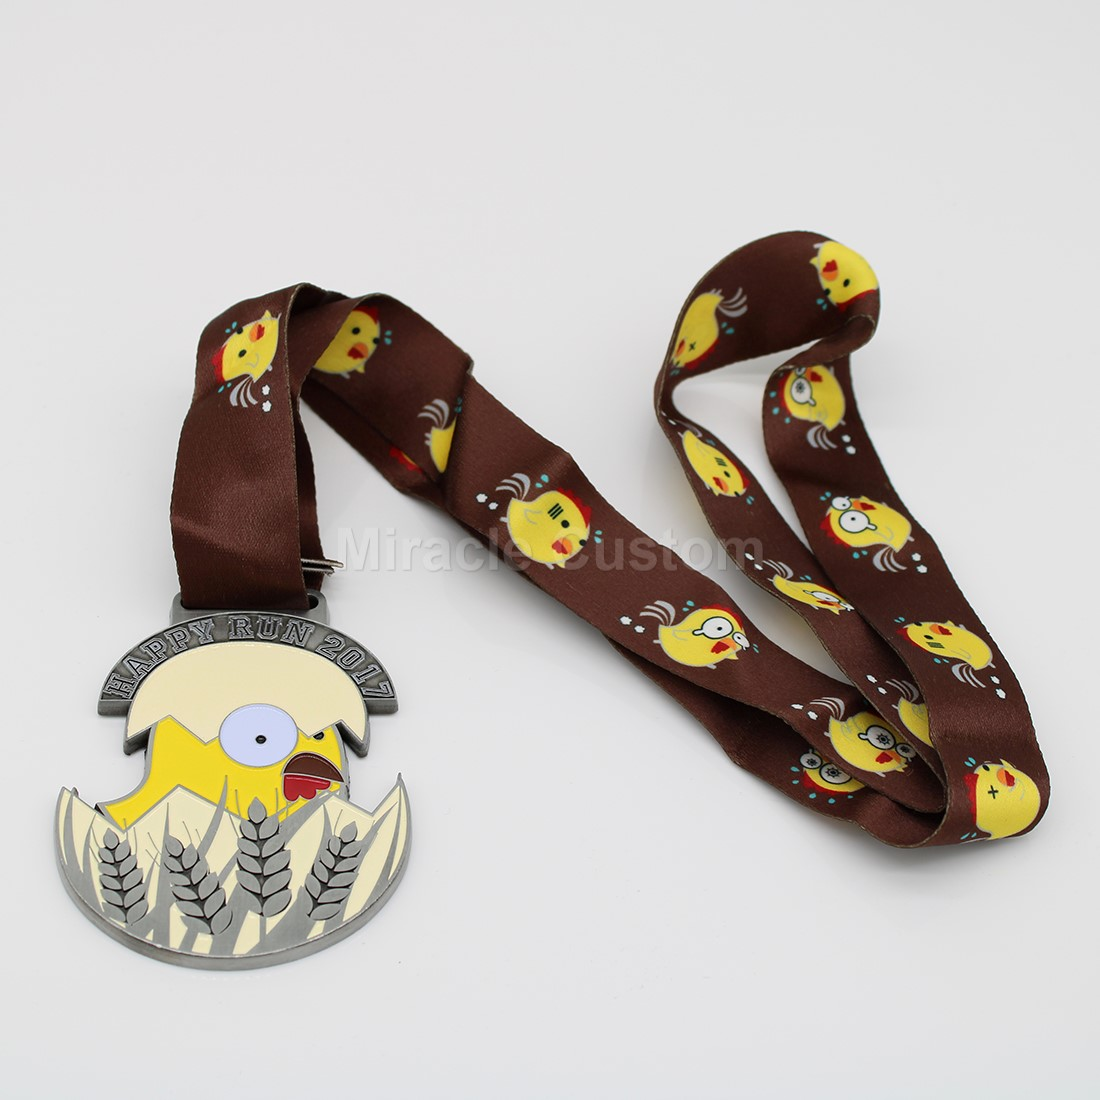 Custom Happy Run Medals